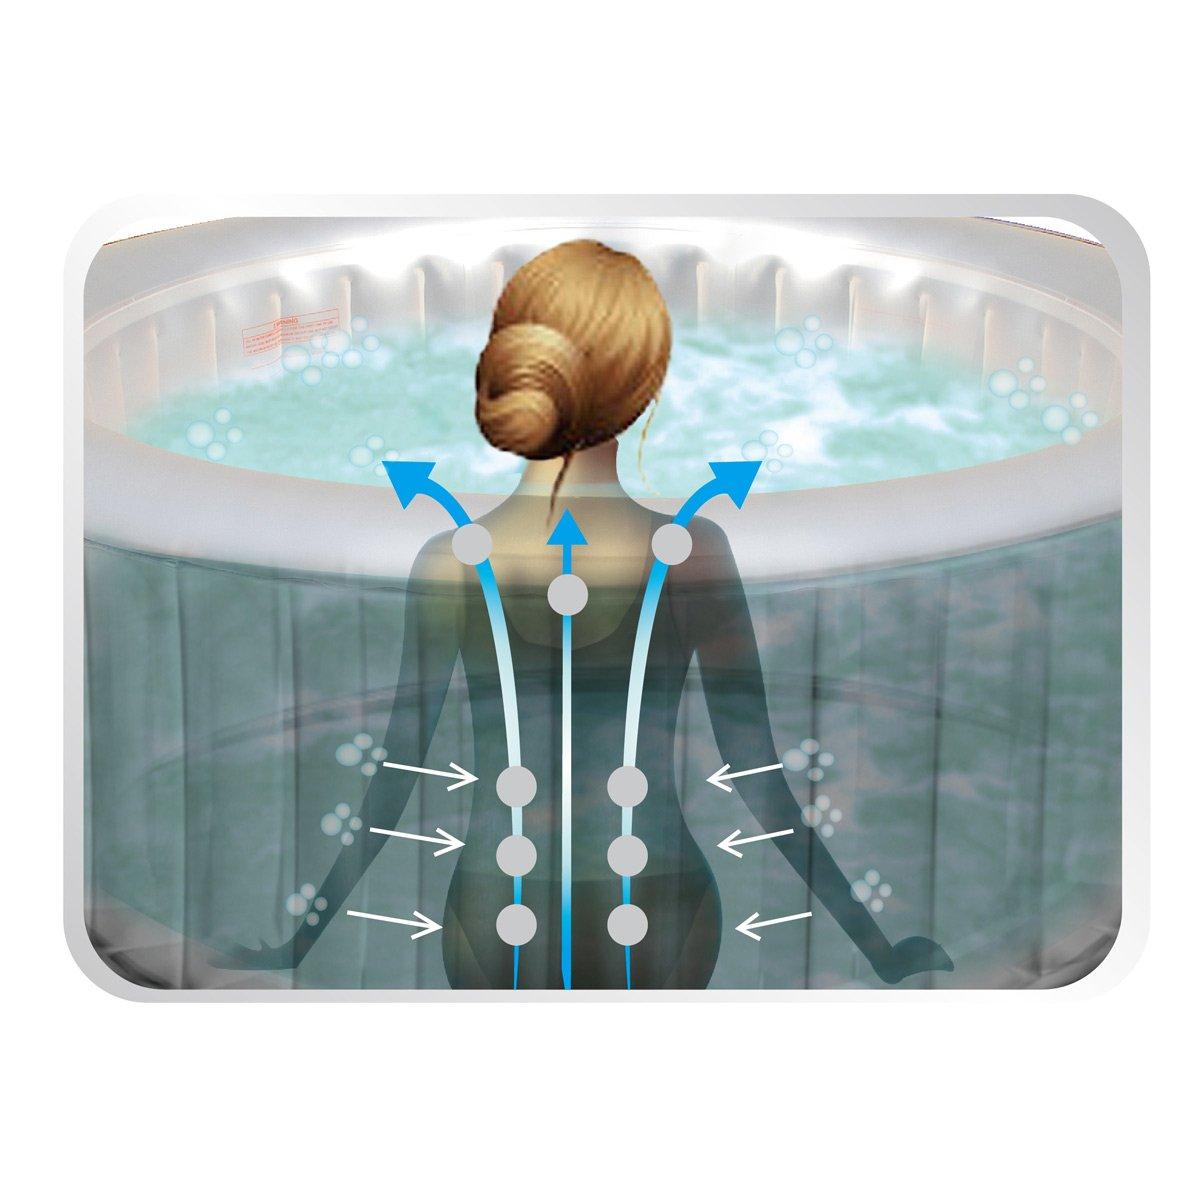 Whirlpool In-Outdoor Pool Bubble Spa Wellness Massage Heizung aufblasbar 158x158cm 4 Personen